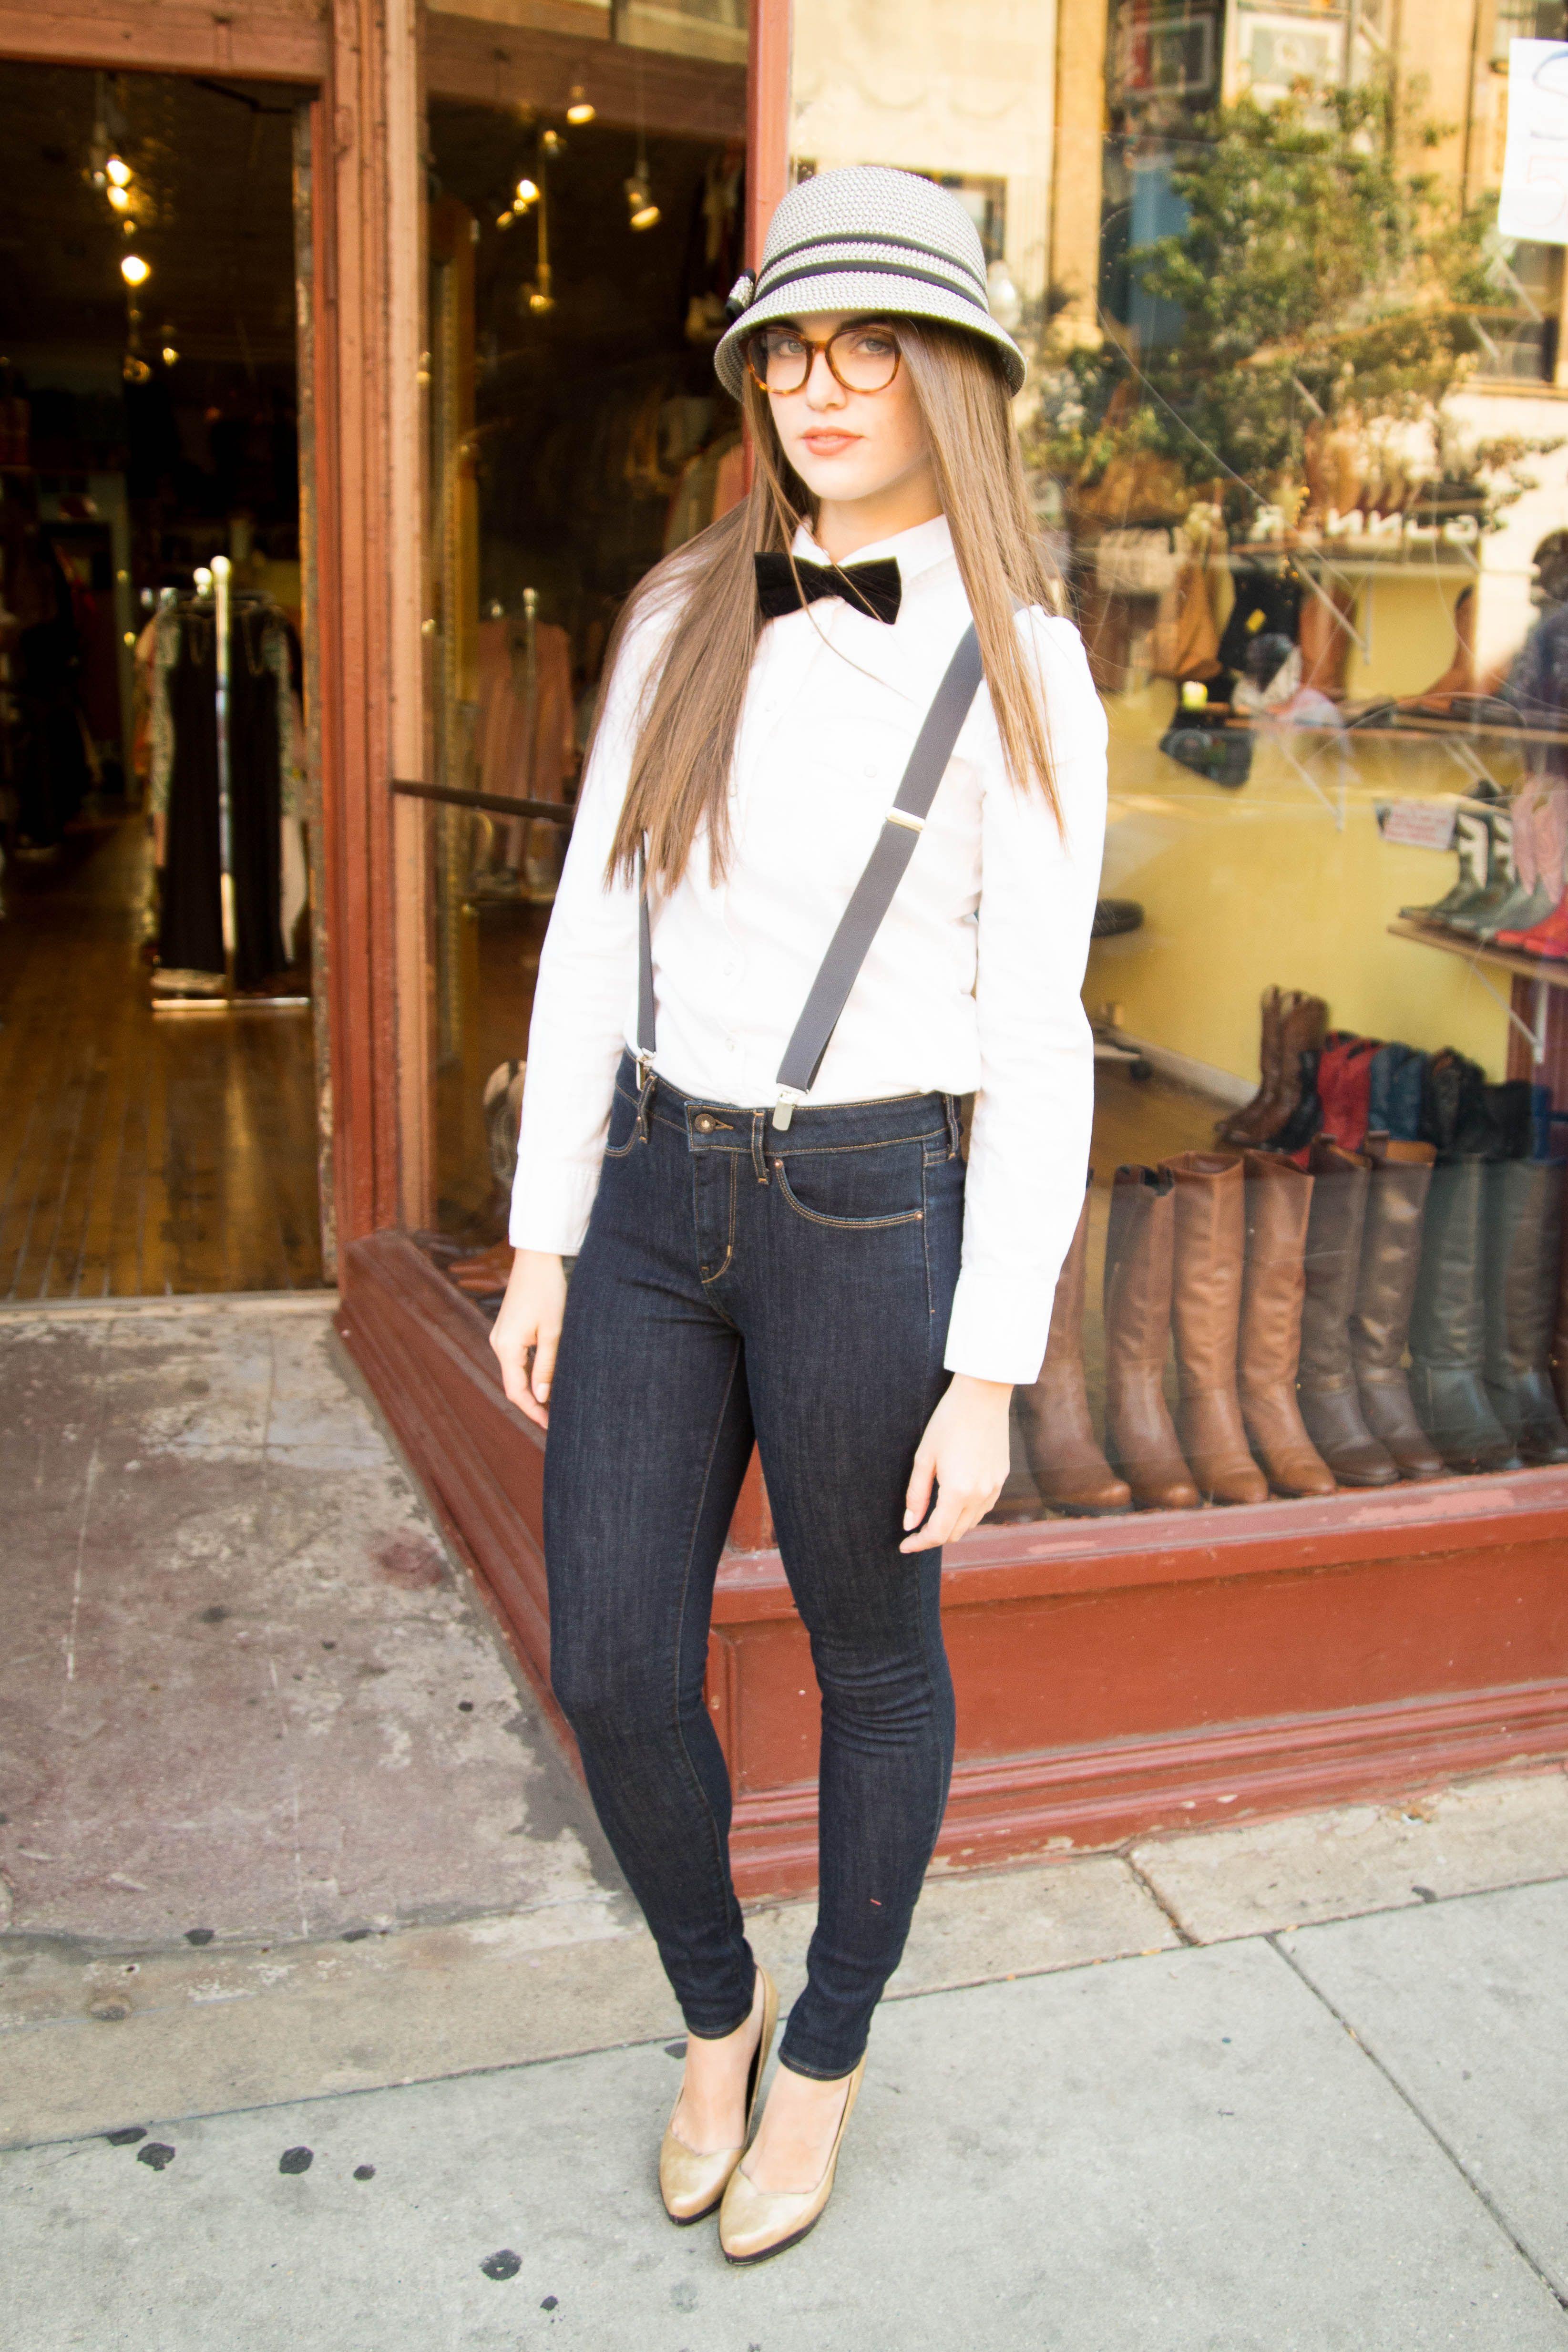 Look - Tipsfashion Fashion challenge overalls video